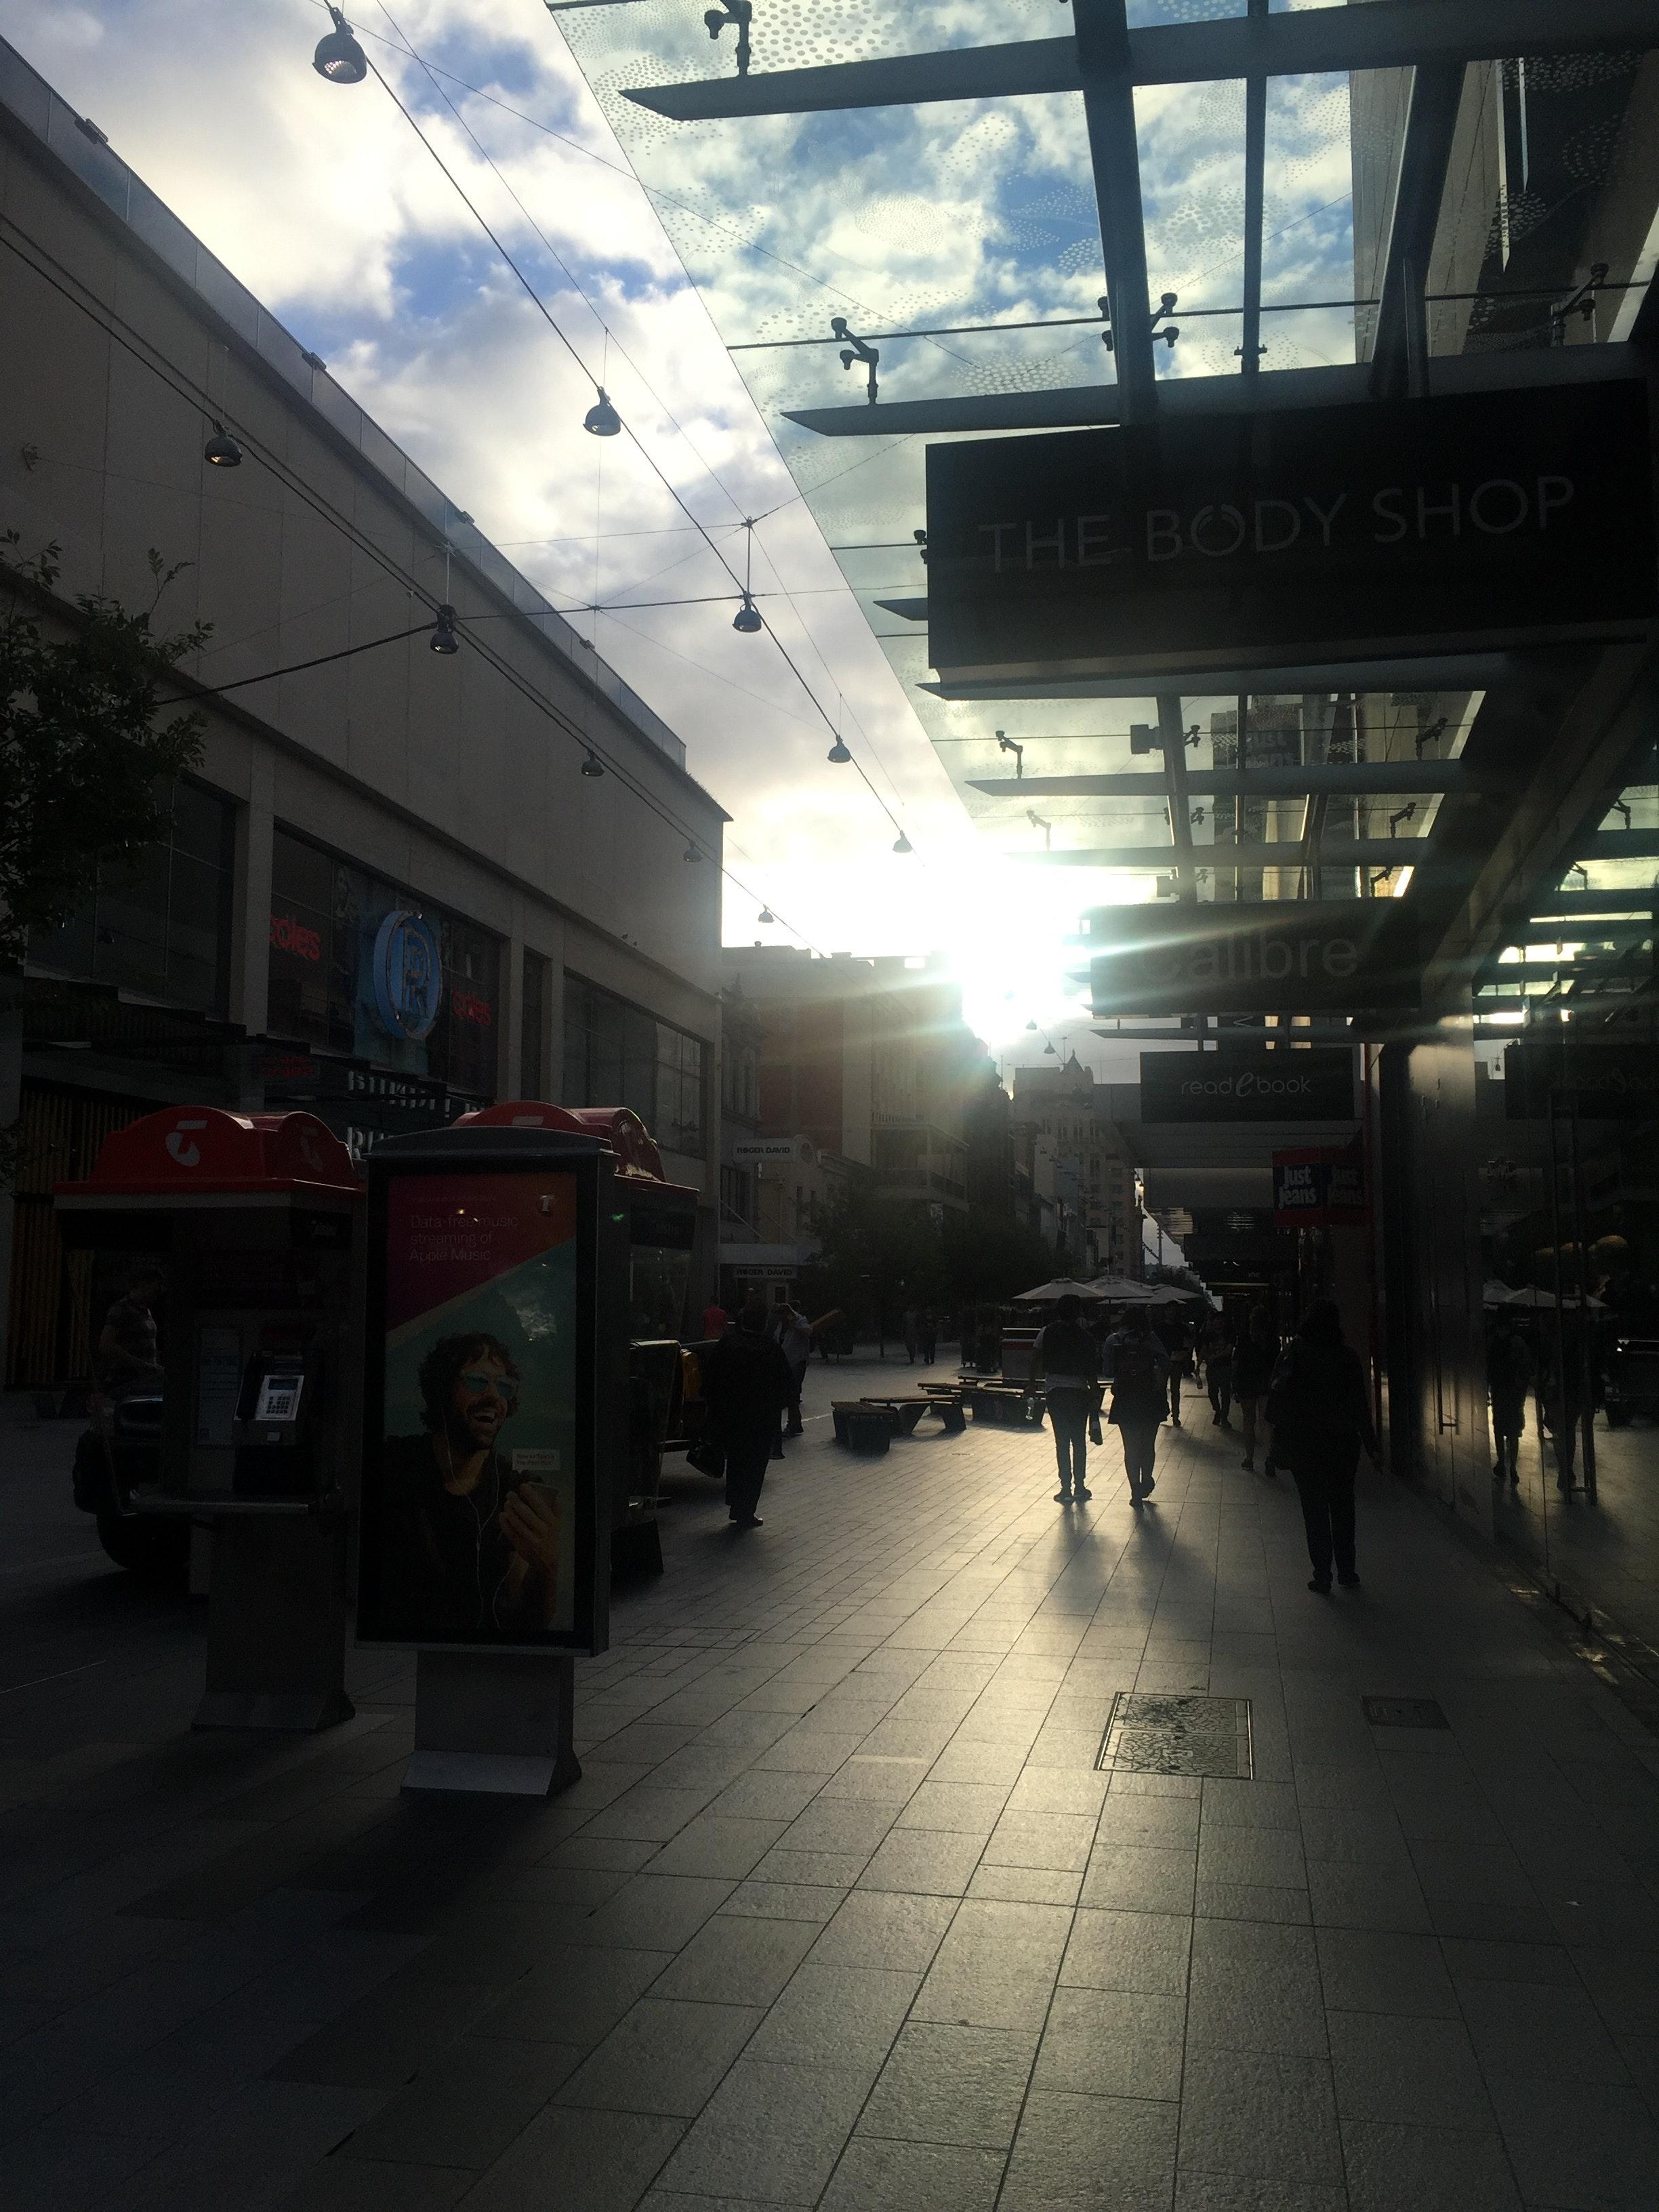 Free stock photo of city center, city life, city lights